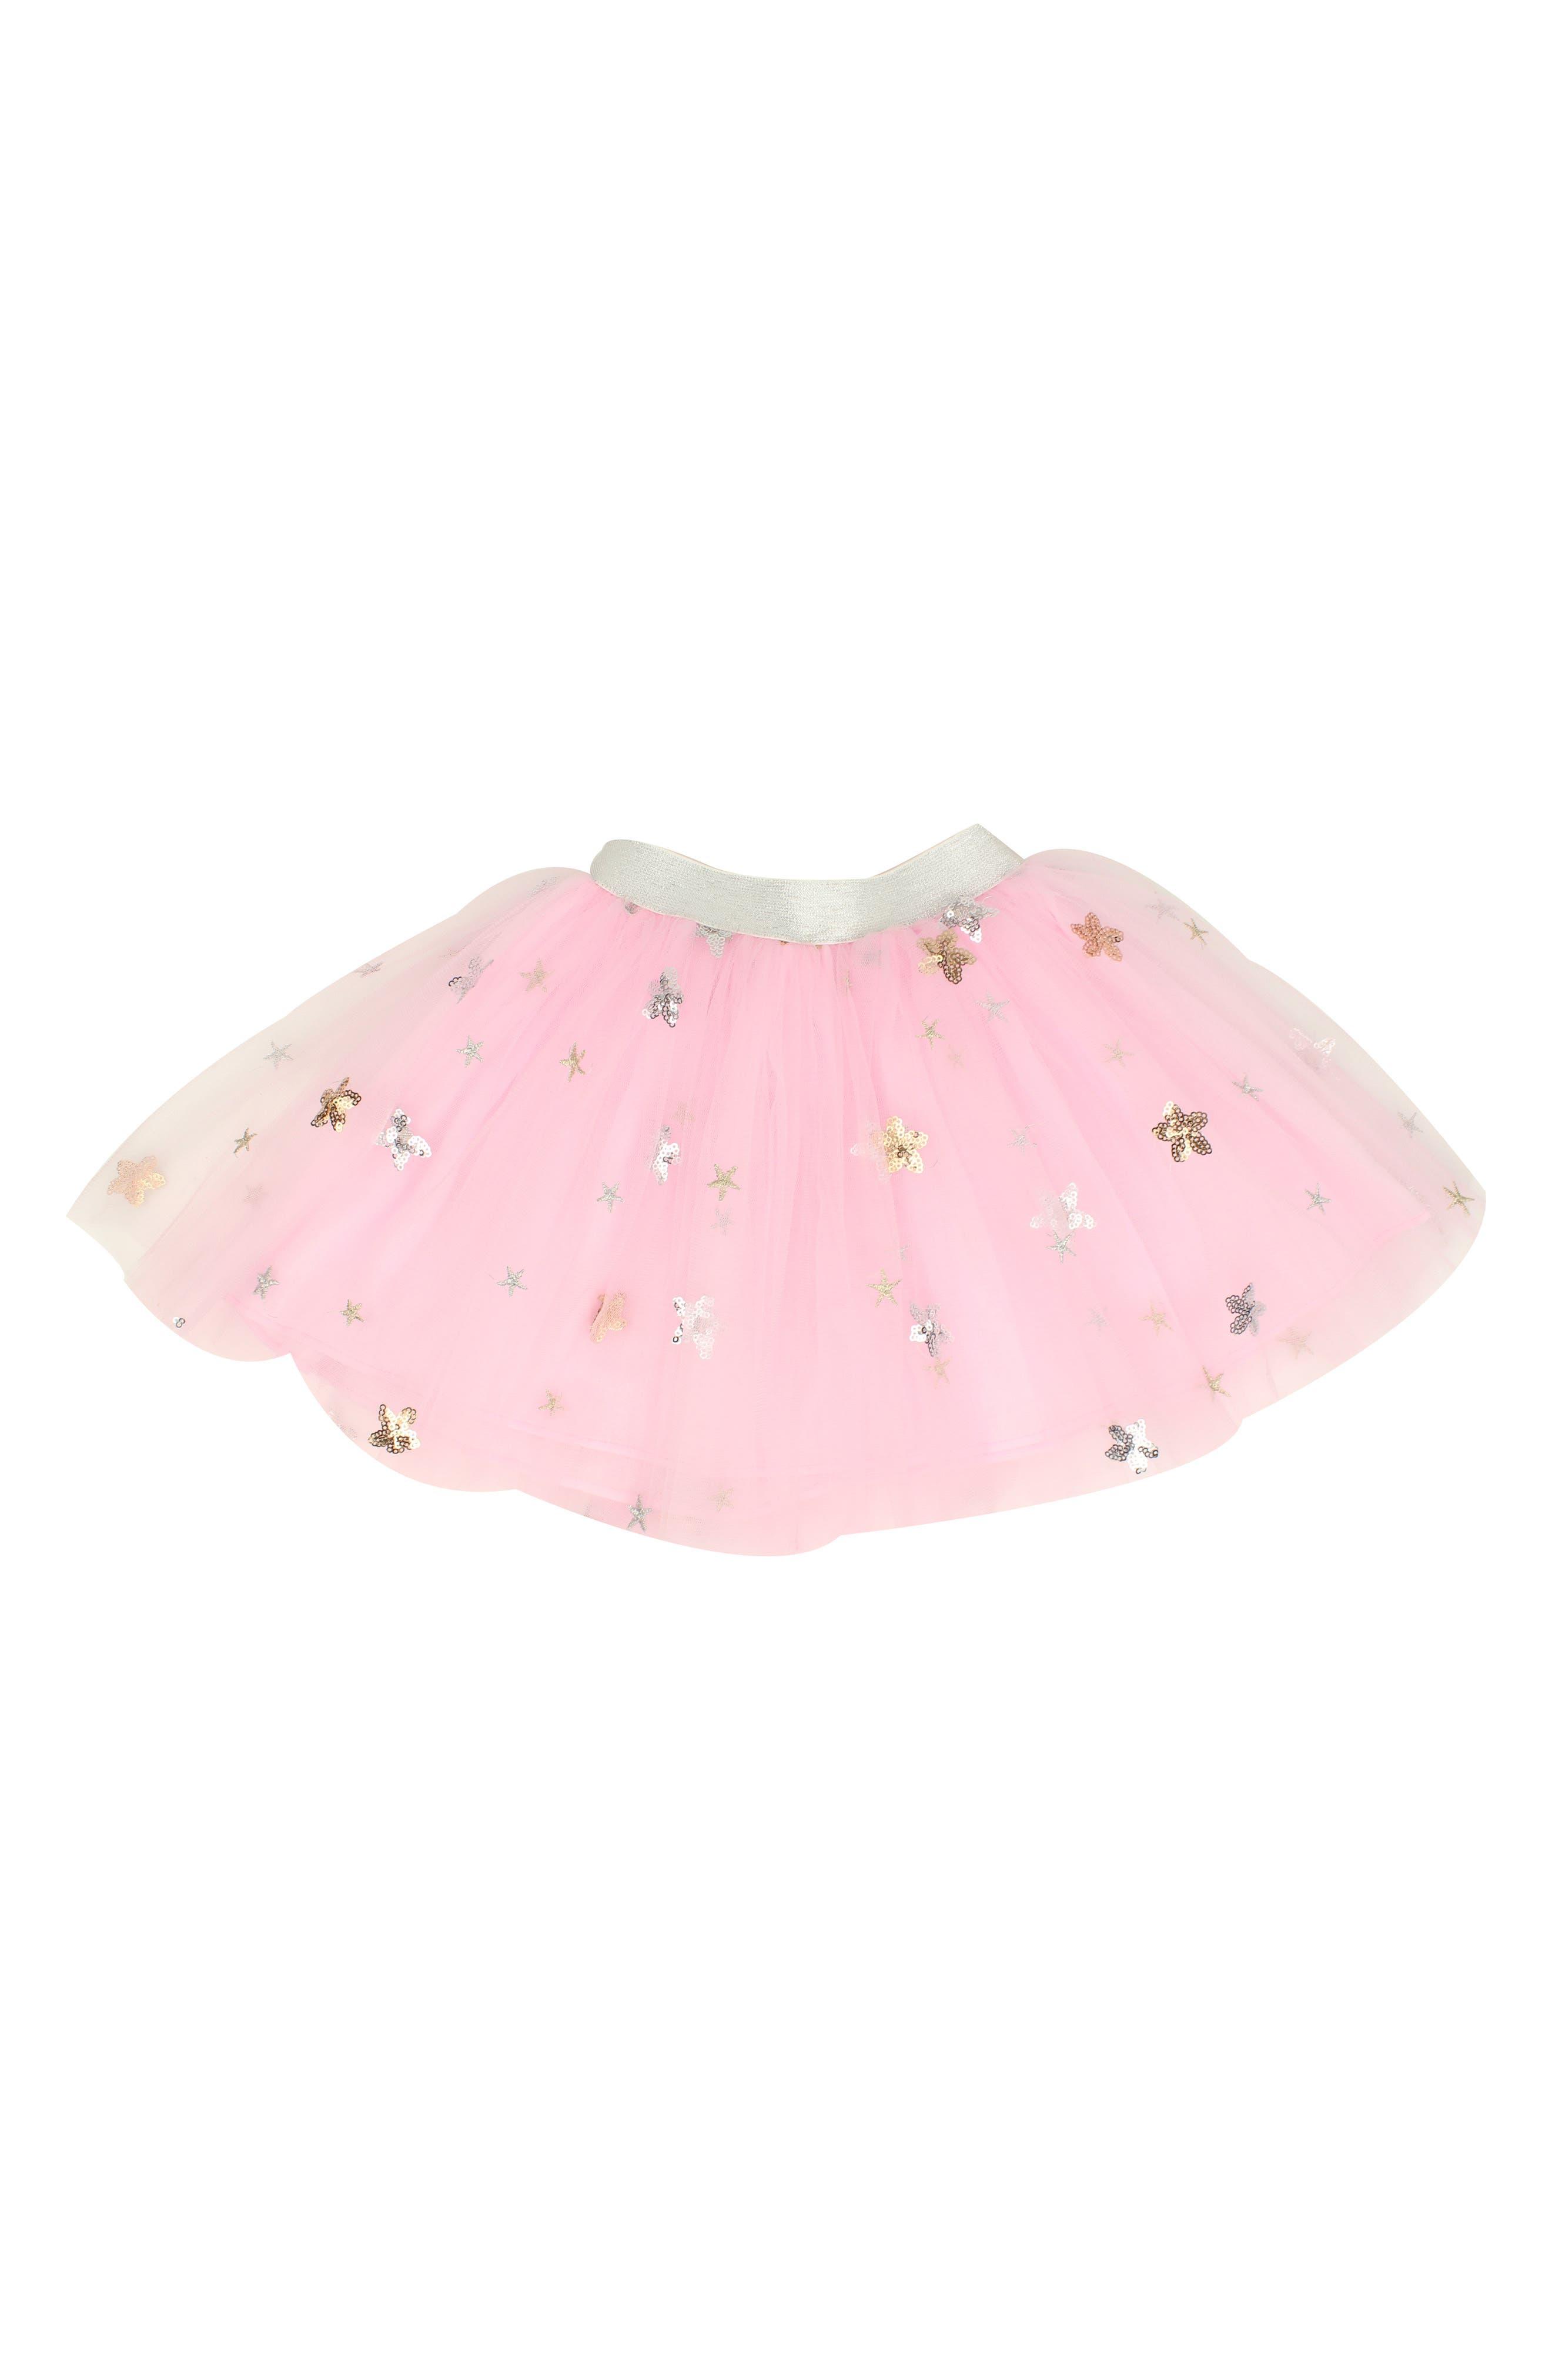 POPATU, Star Tulle Skirt, Main thumbnail 1, color, PINK